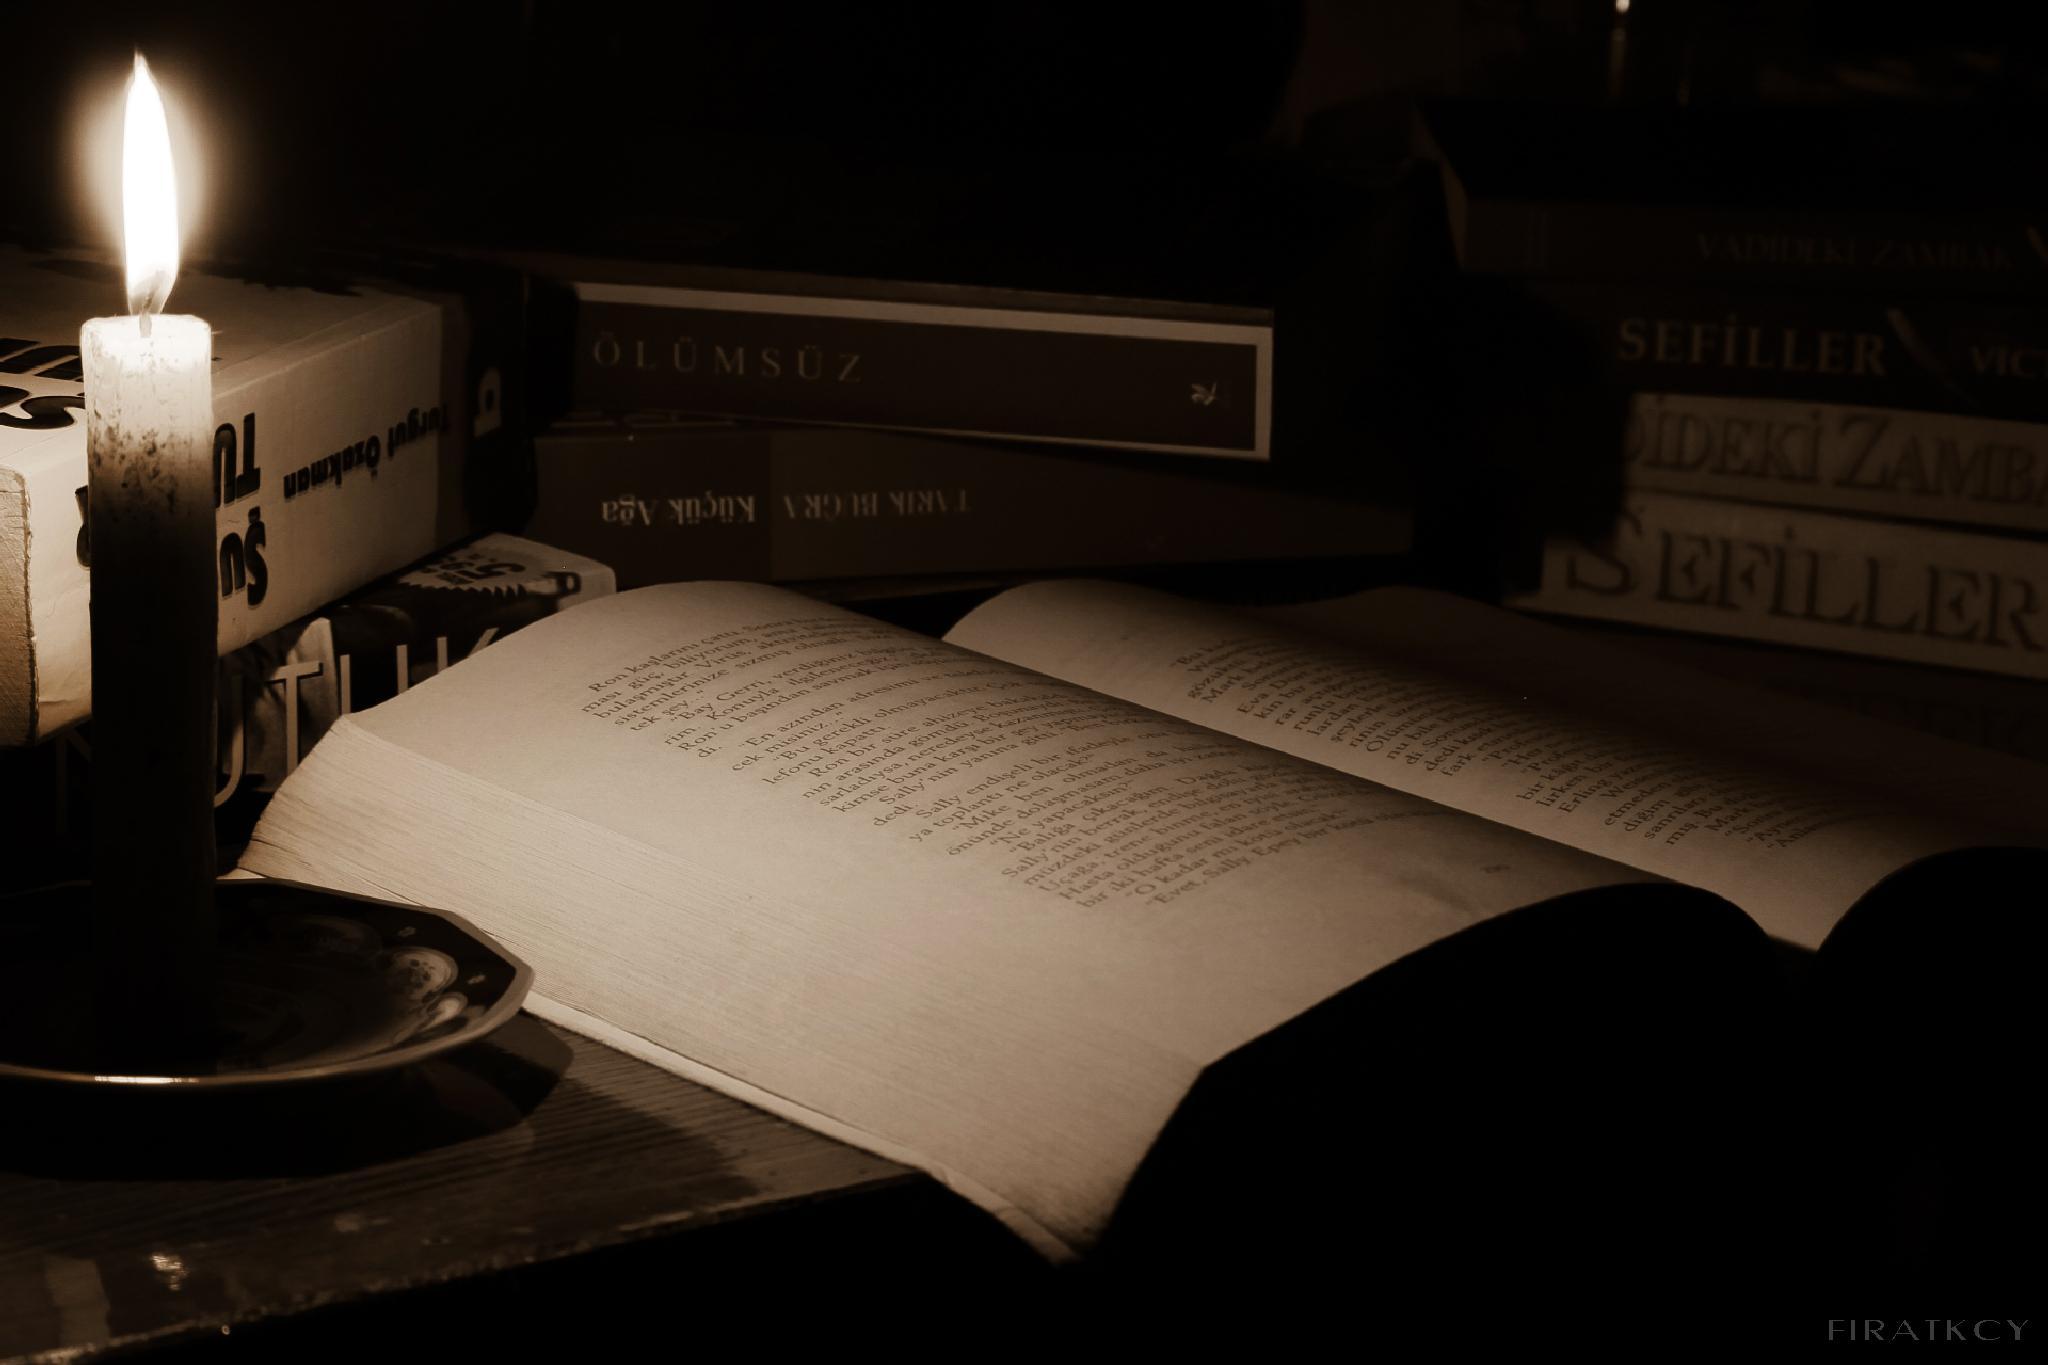 ride a book kitap okumak by firat_kacay